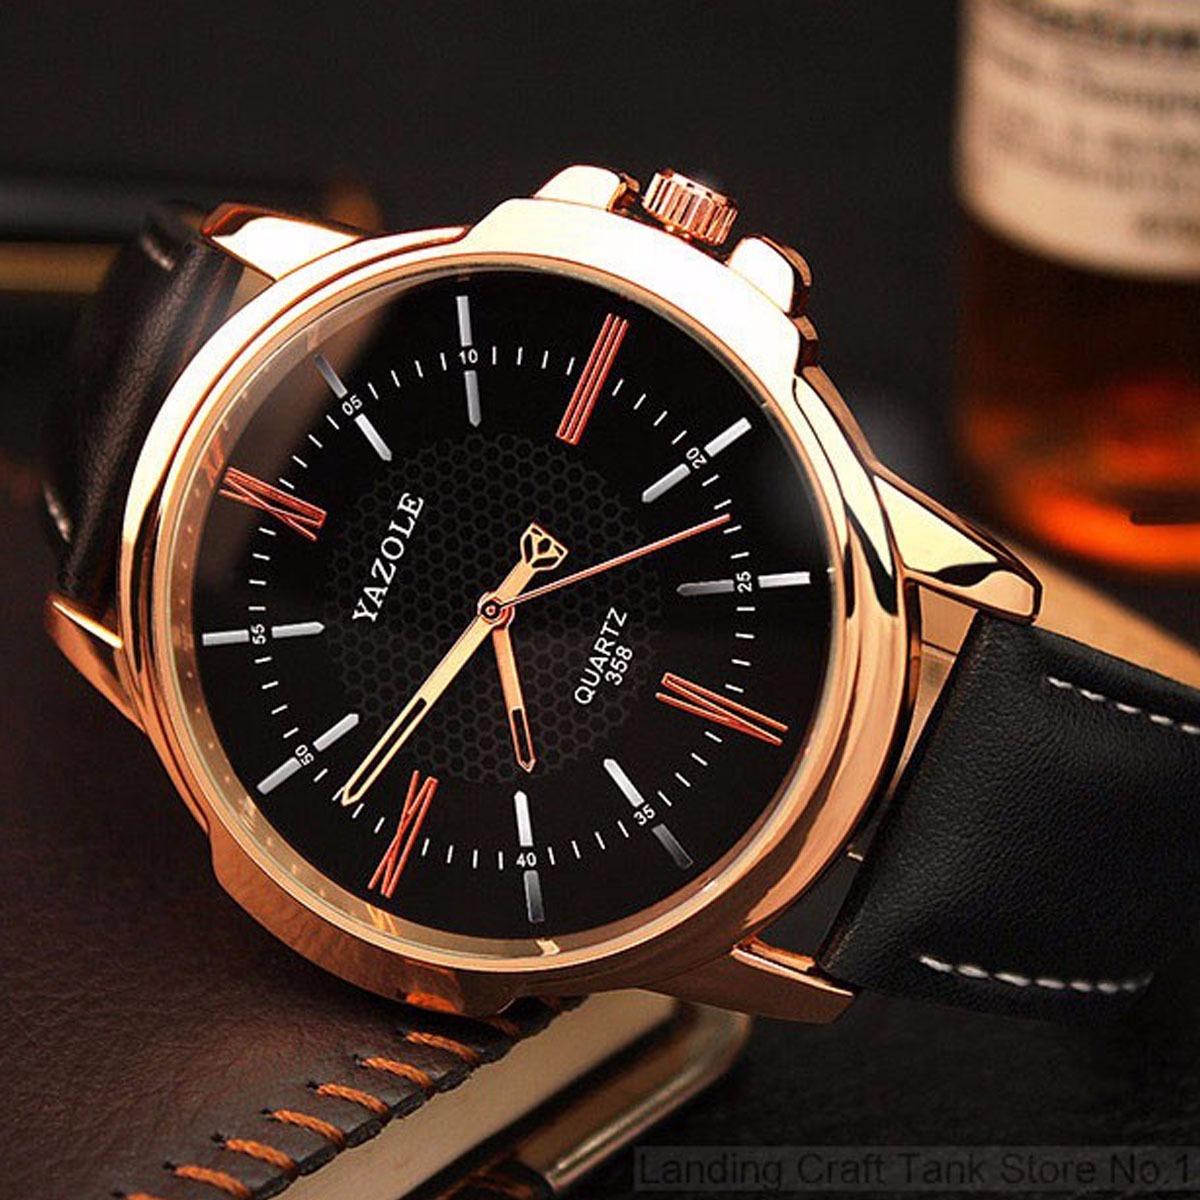 423aba4d547 relógio masculino luxo yazole pulso social pulseira couro n4. Carregando  zoom.